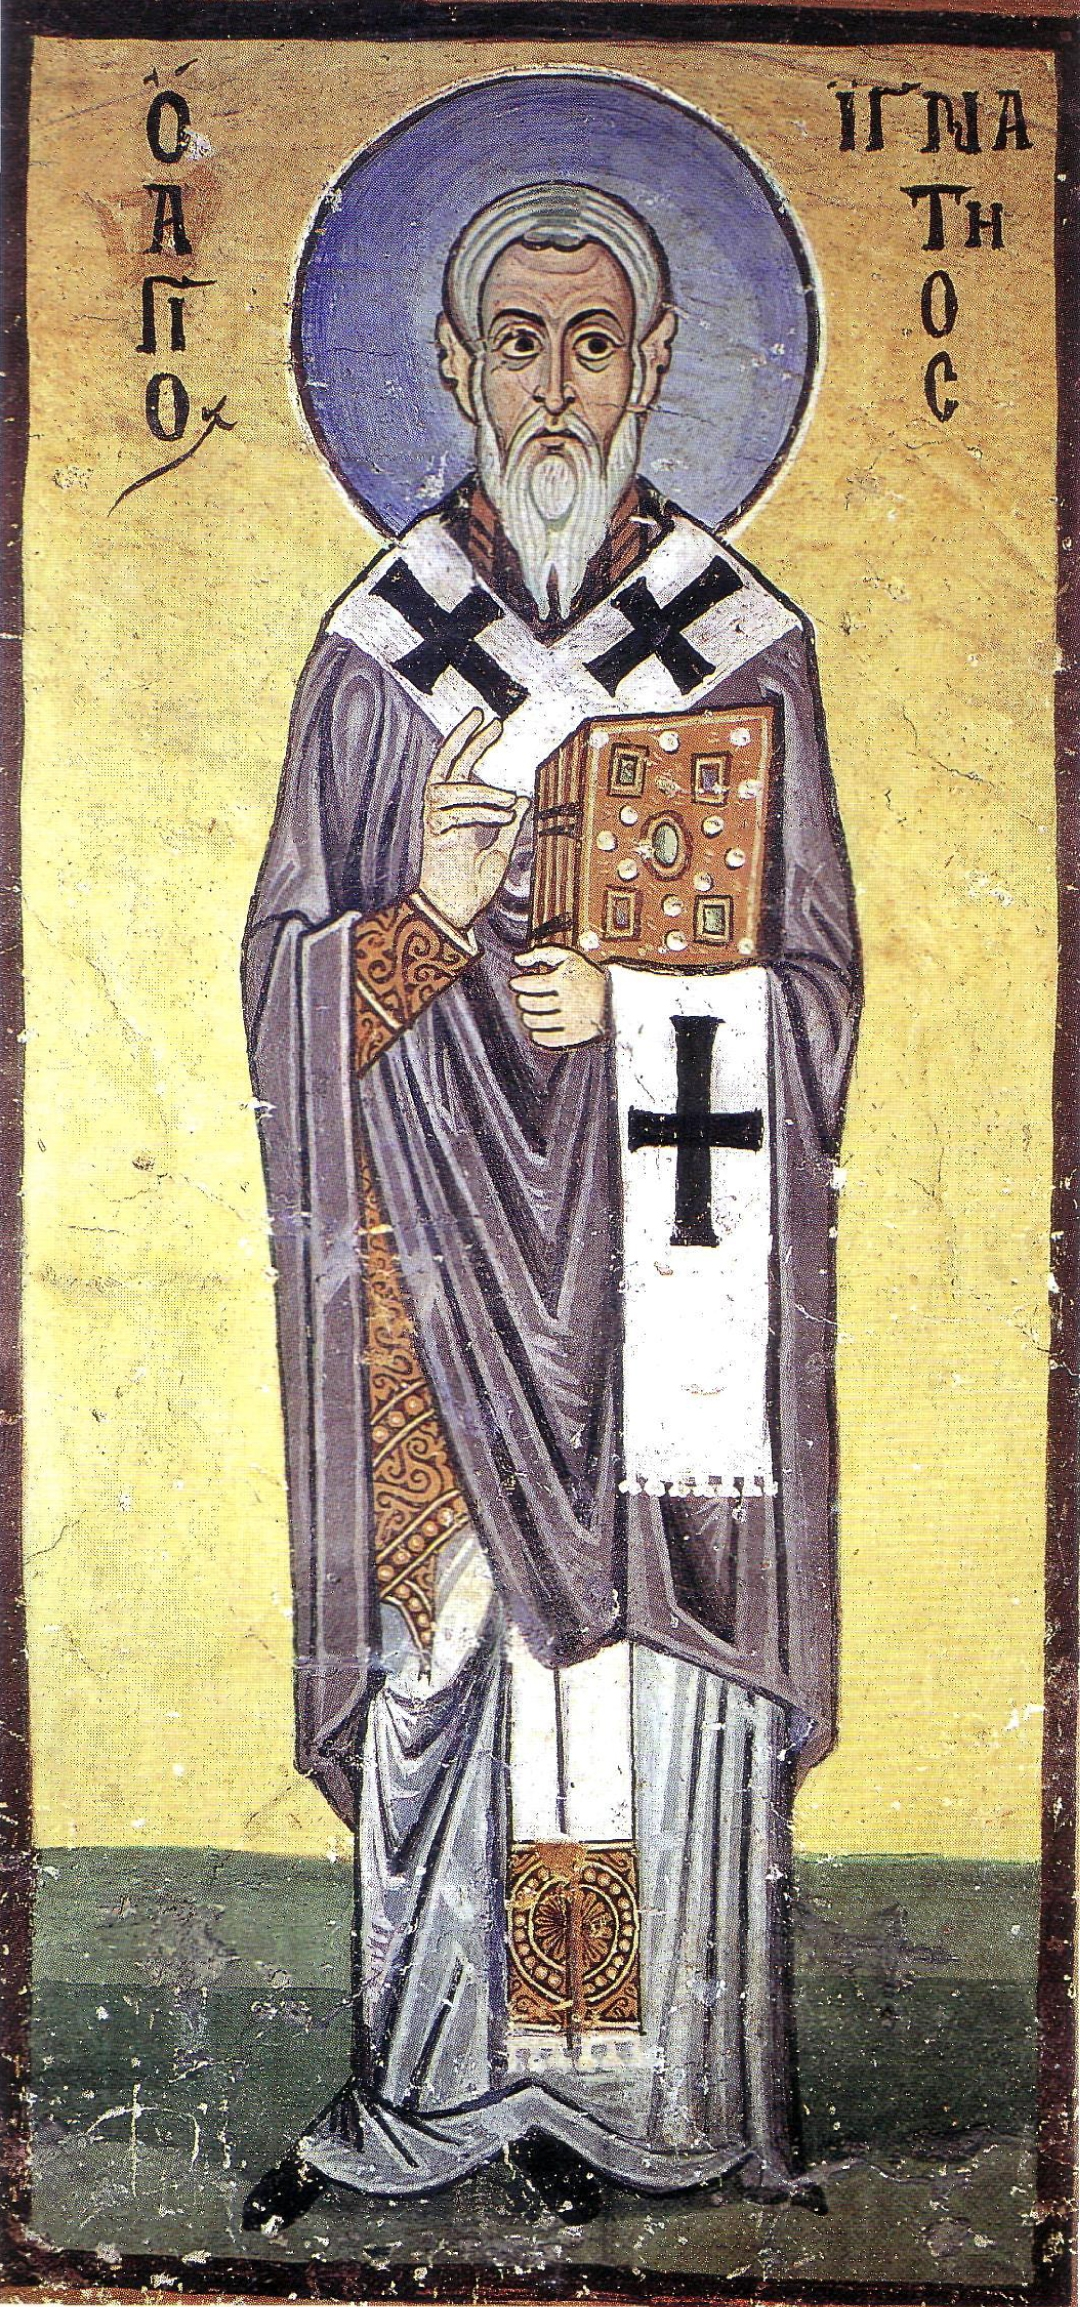 Fresco of St. Ignatius of Antioch from Hosios Loukas Monastery, Boeotia, Greece.